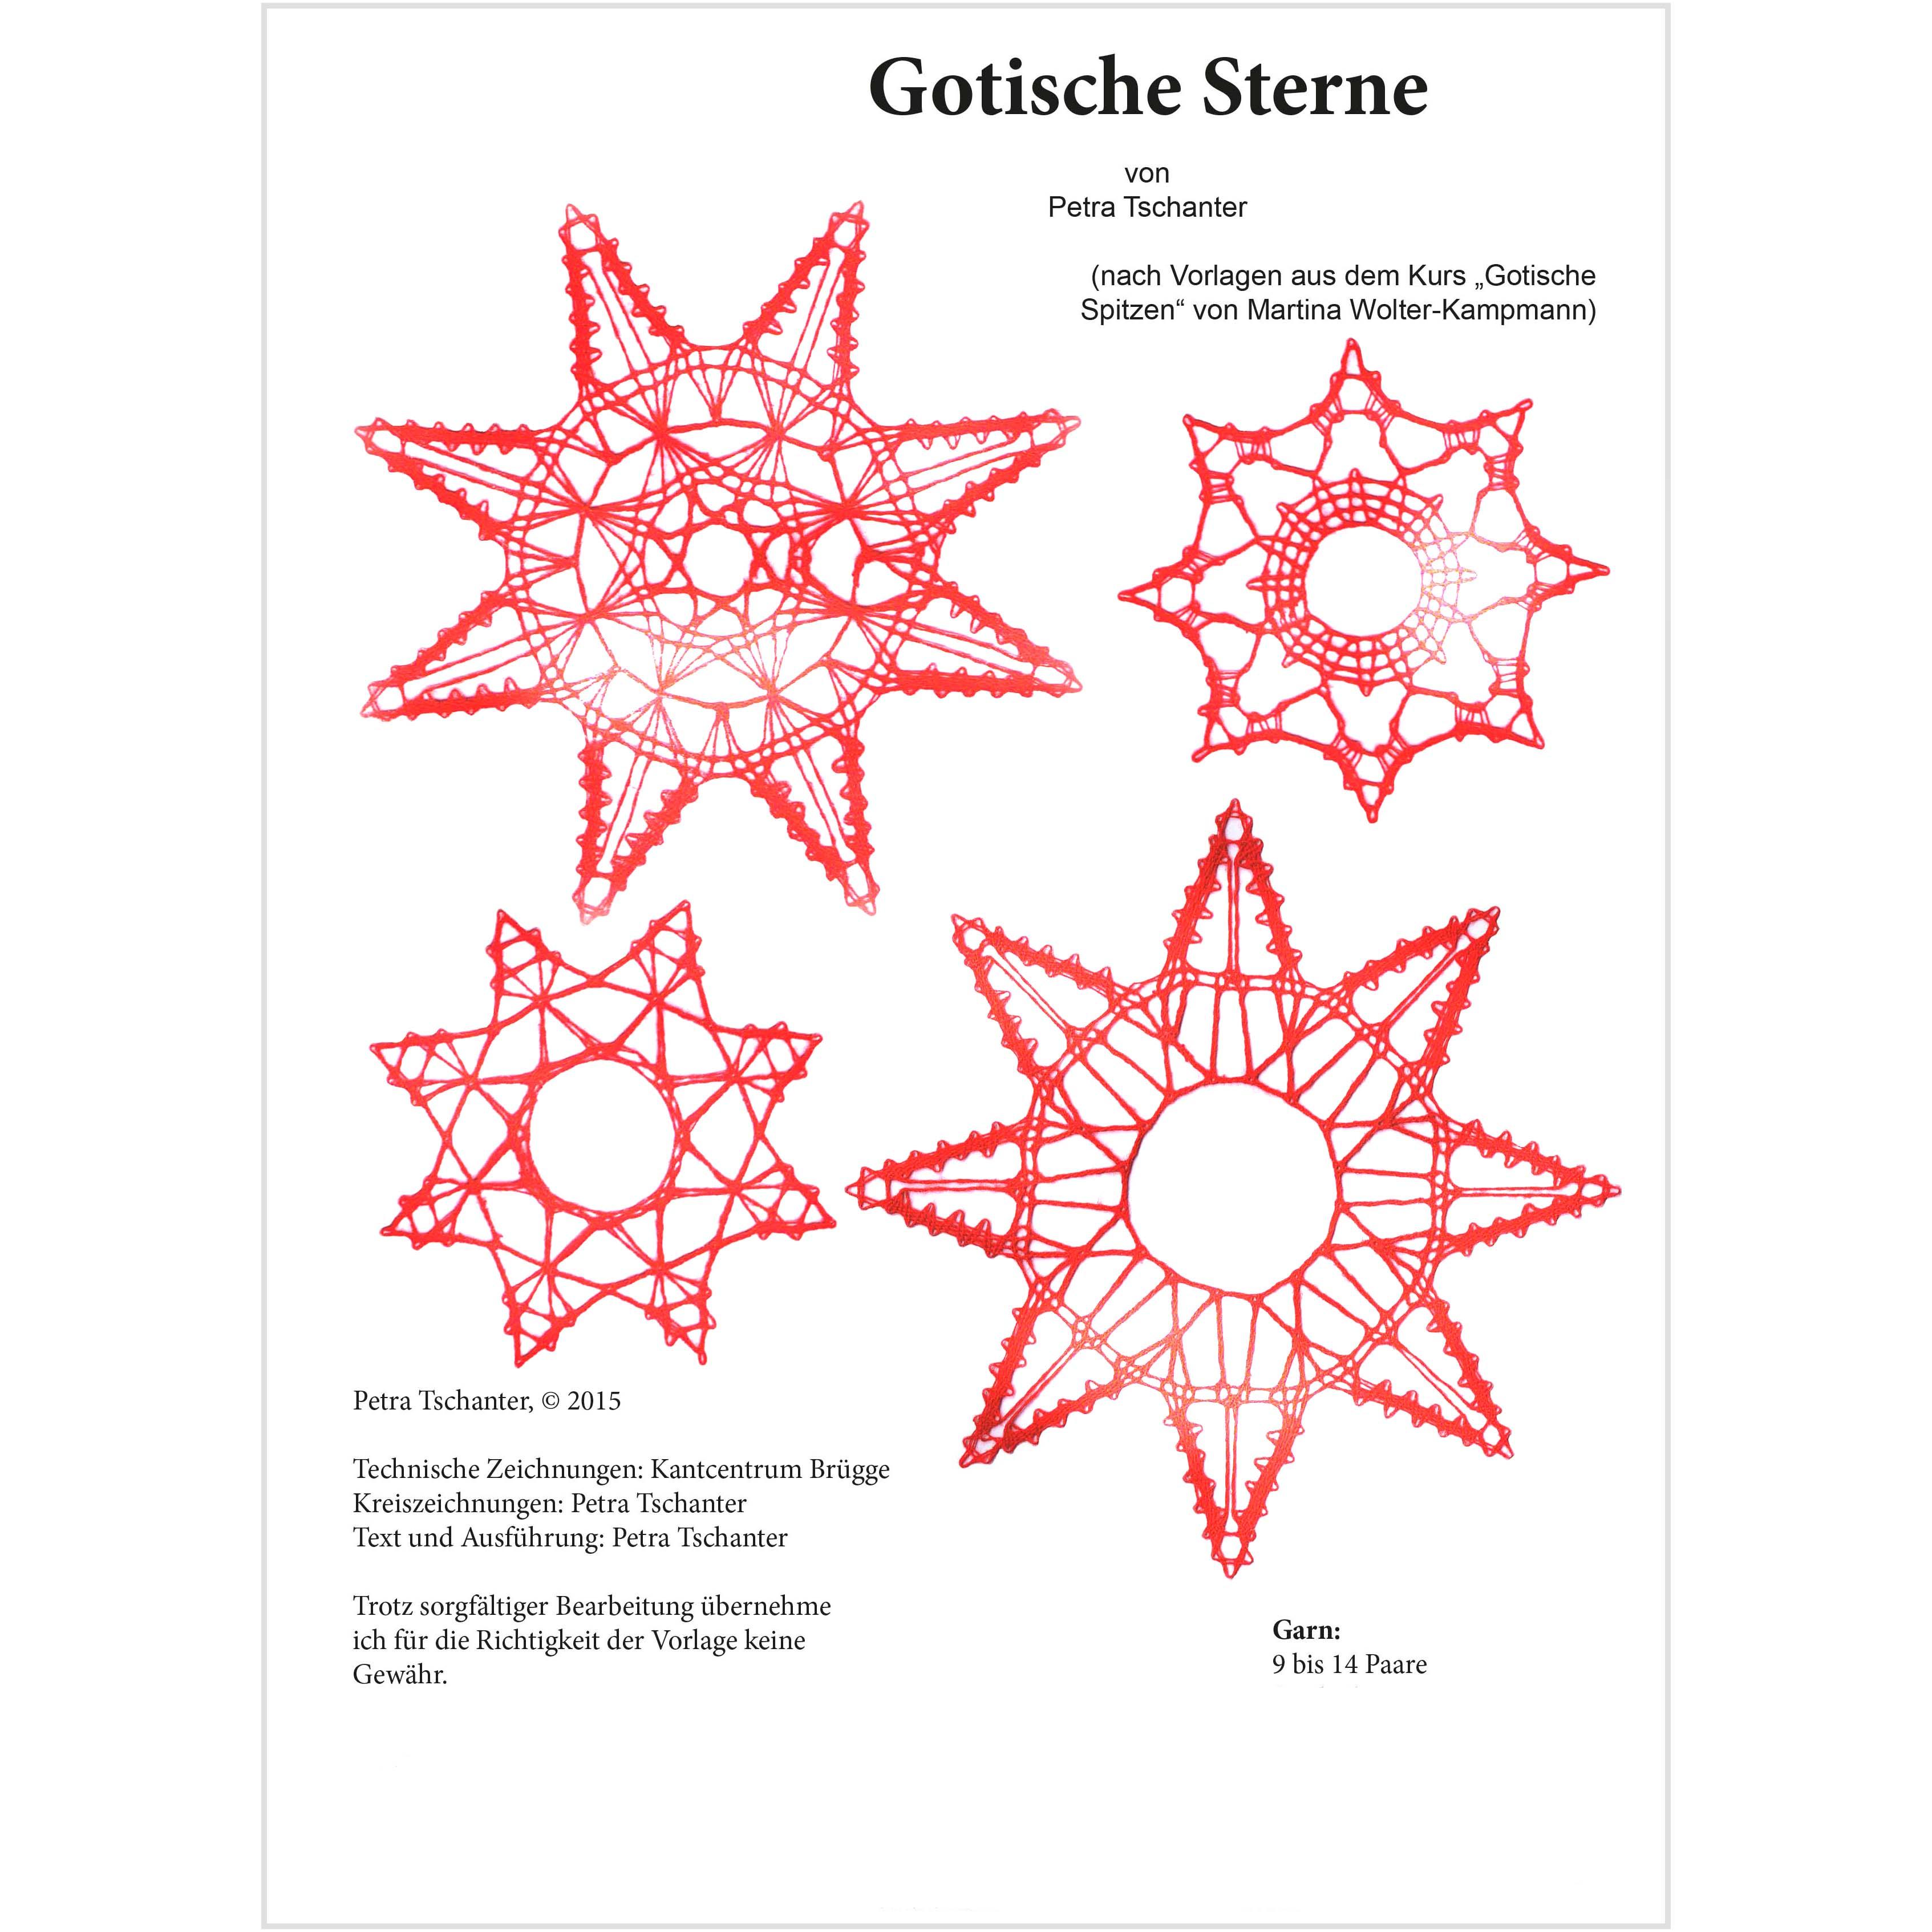 Klöpelbrief Gotische Sterne~Petra Tschanter Klöppelbrief